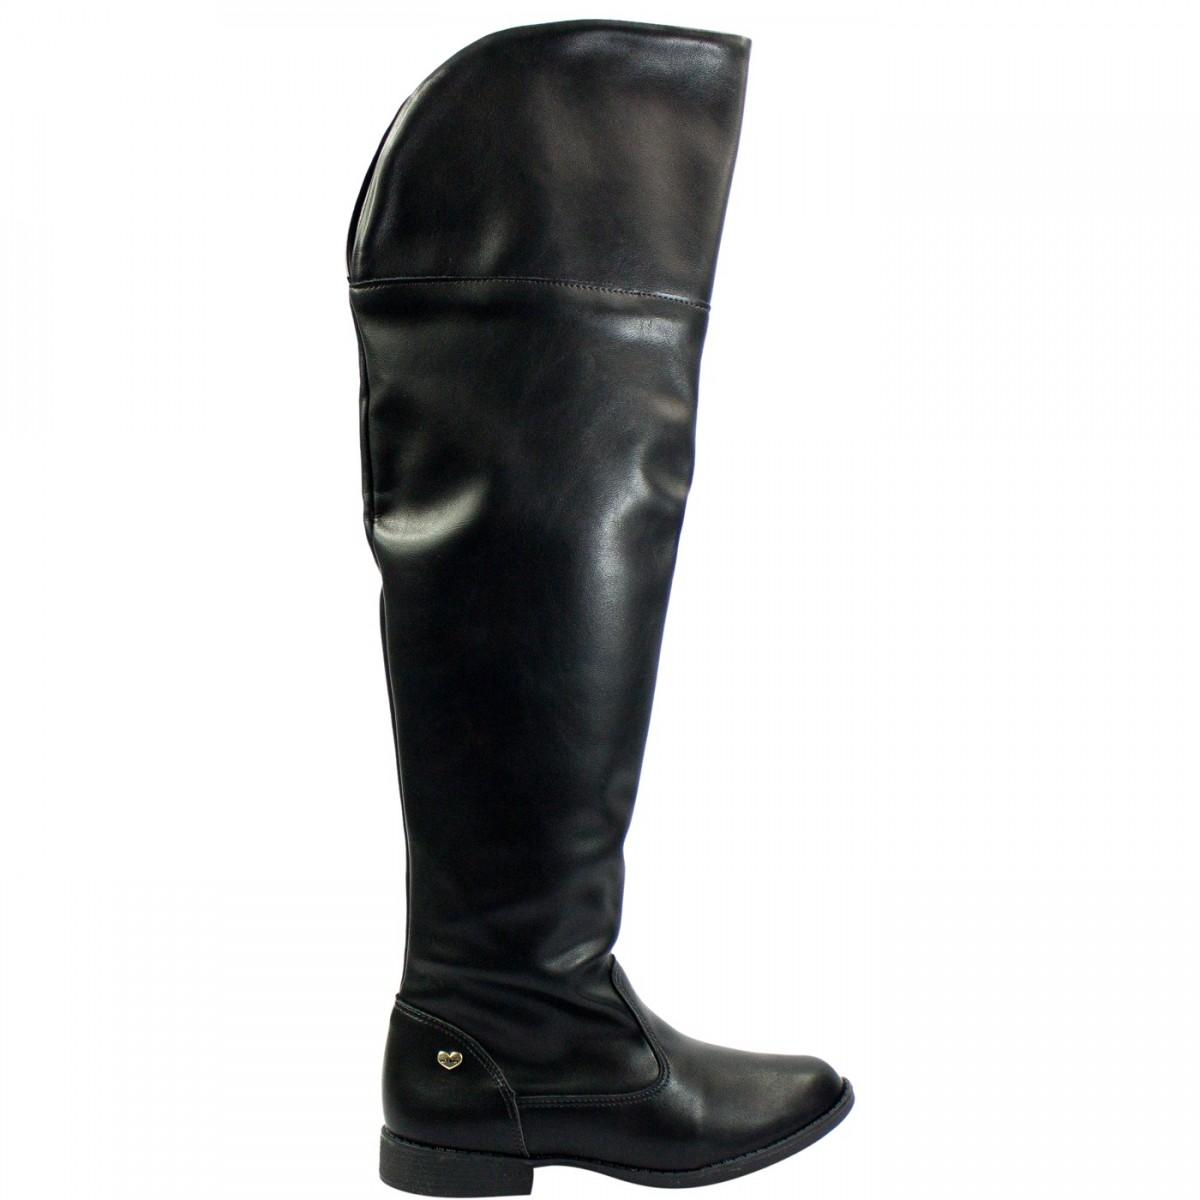 acbce8bde Bizz Store - Bota Over The Knee Infantil Feminina Ortopé Ecoflex